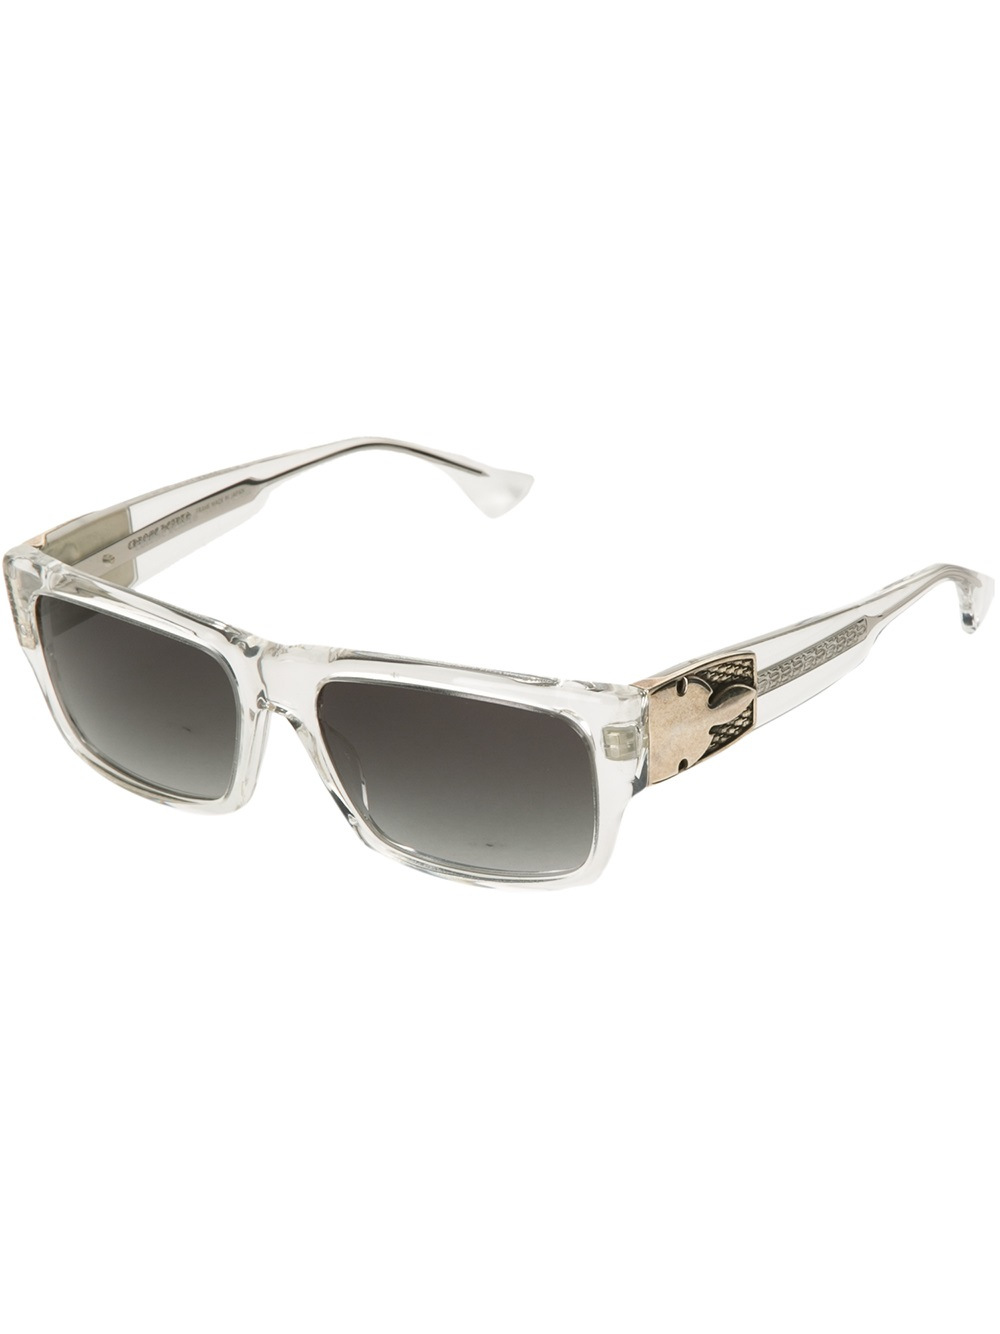 7c8b5dc40ac4 Lyst - Chrome Hearts Gmoney Sunglasses for Men